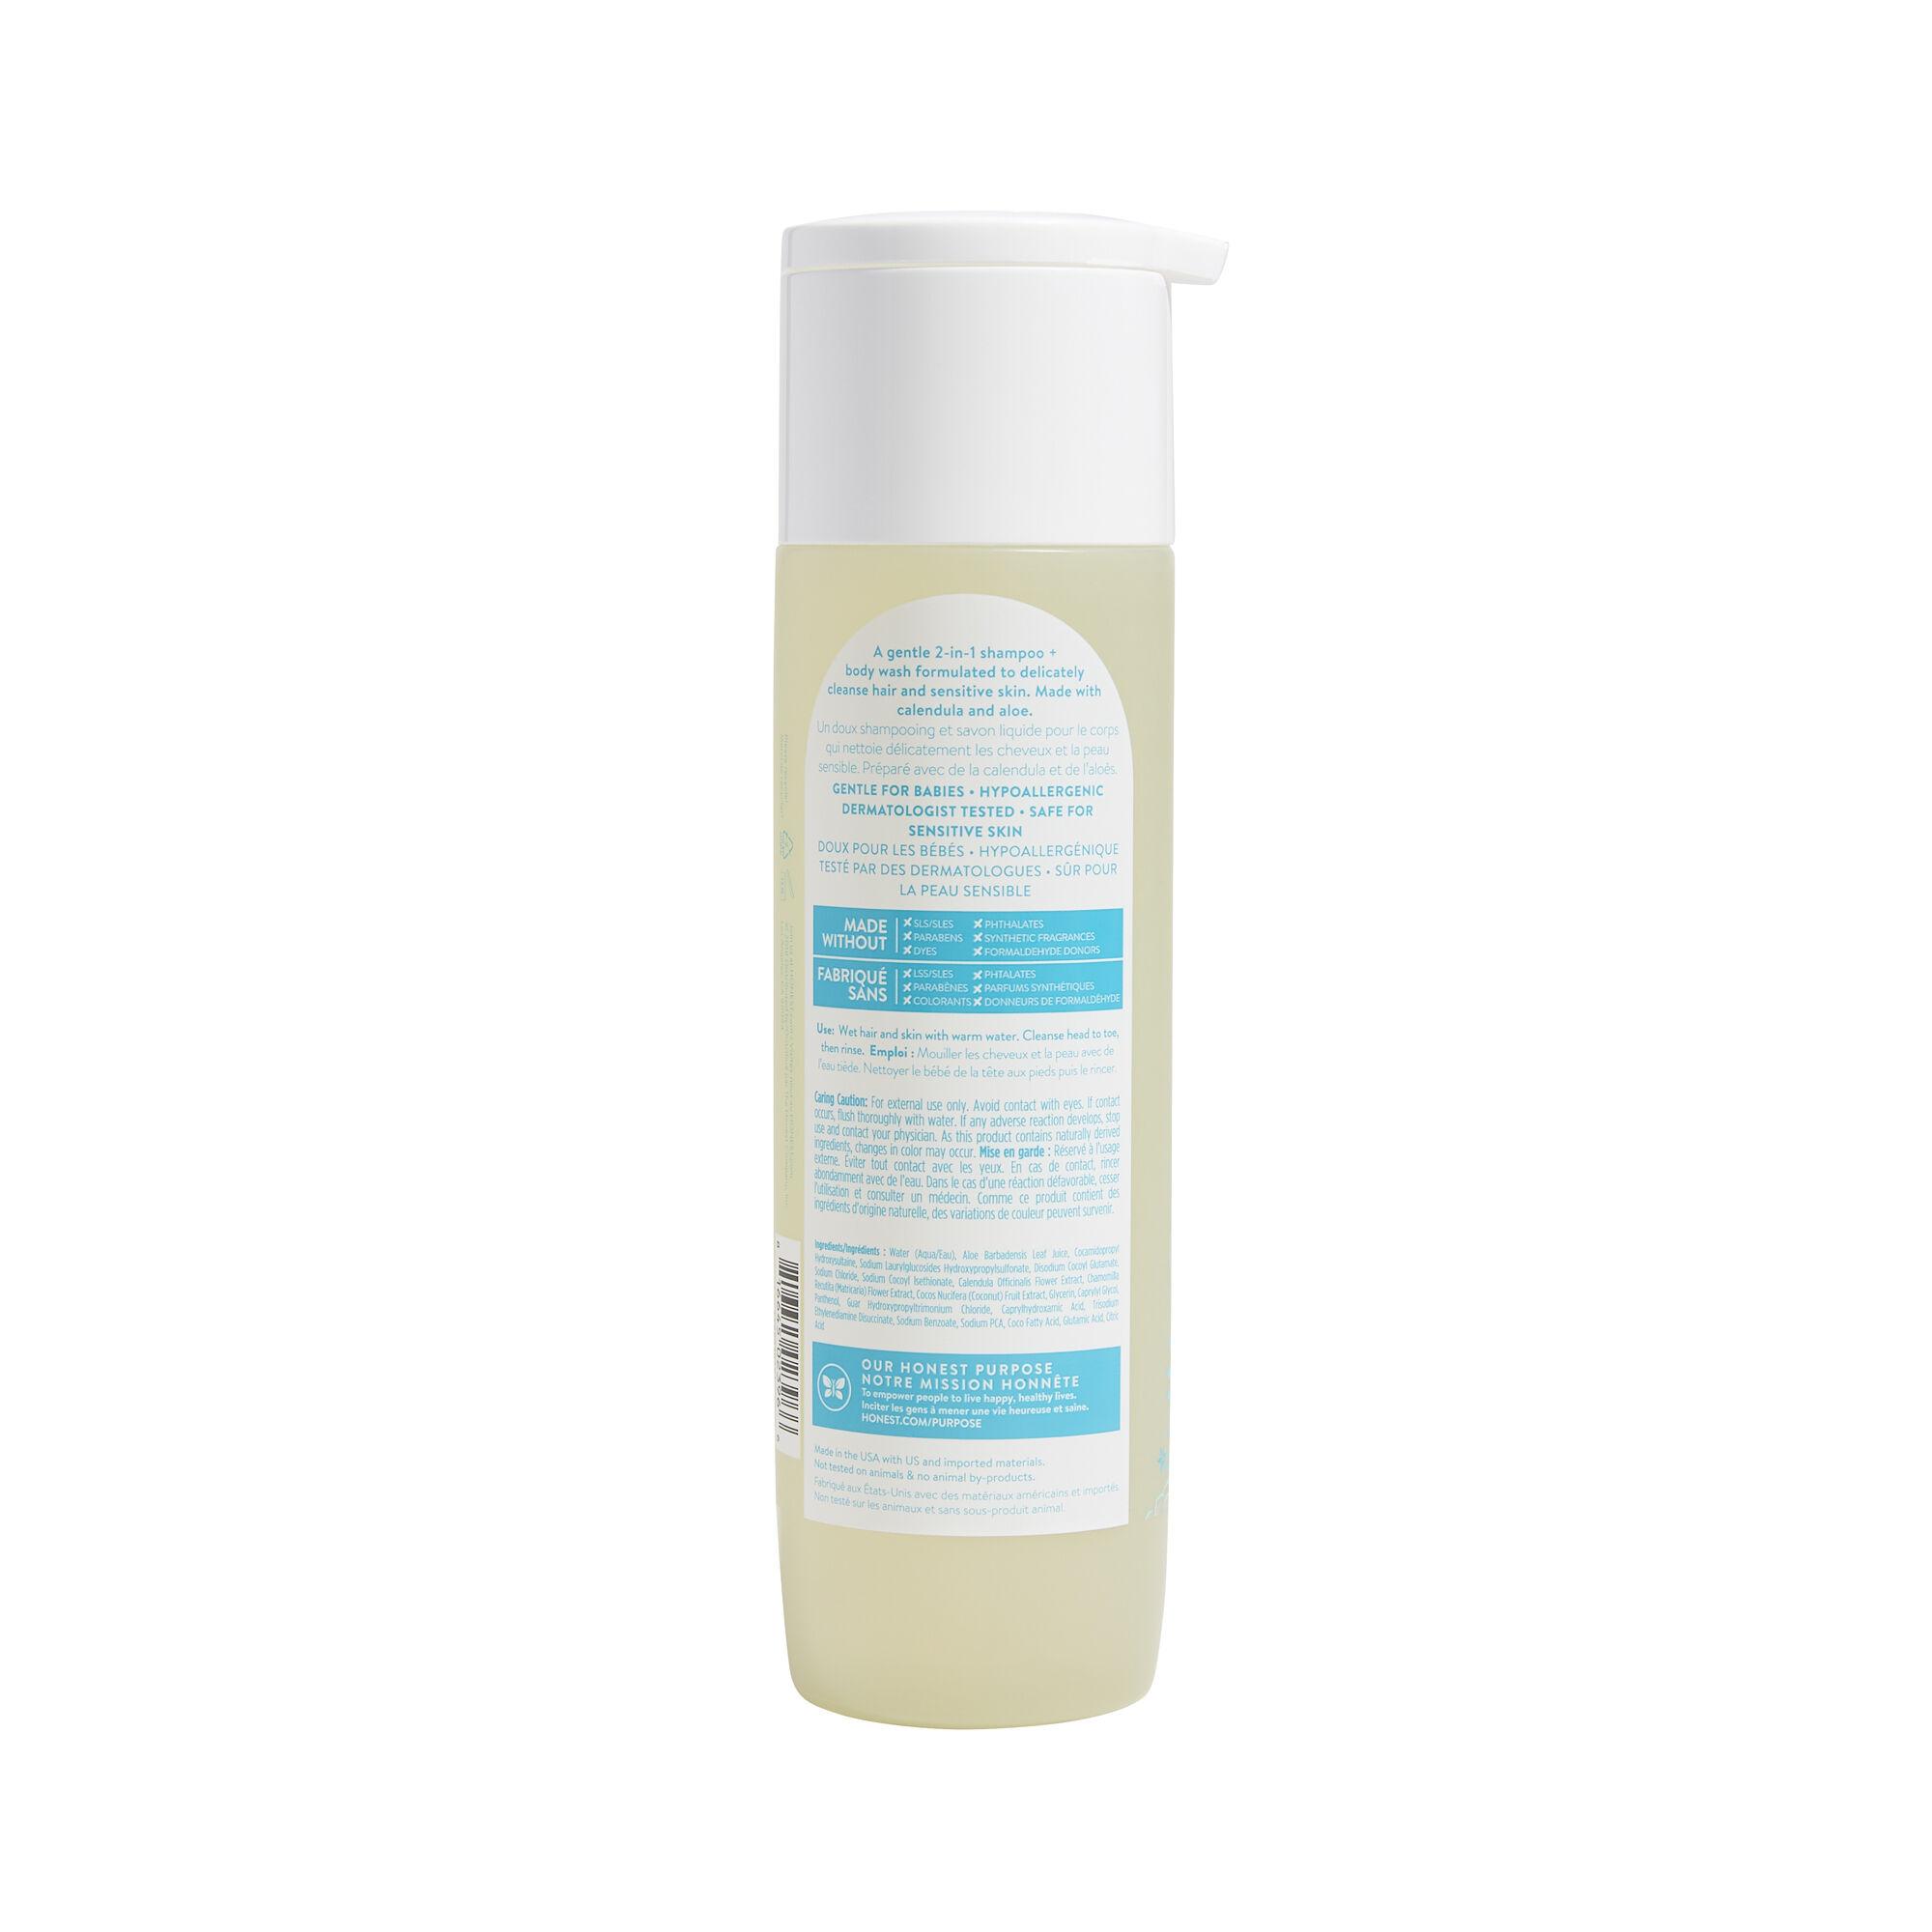 Shampoo + Body Wash - Purely Sensitive